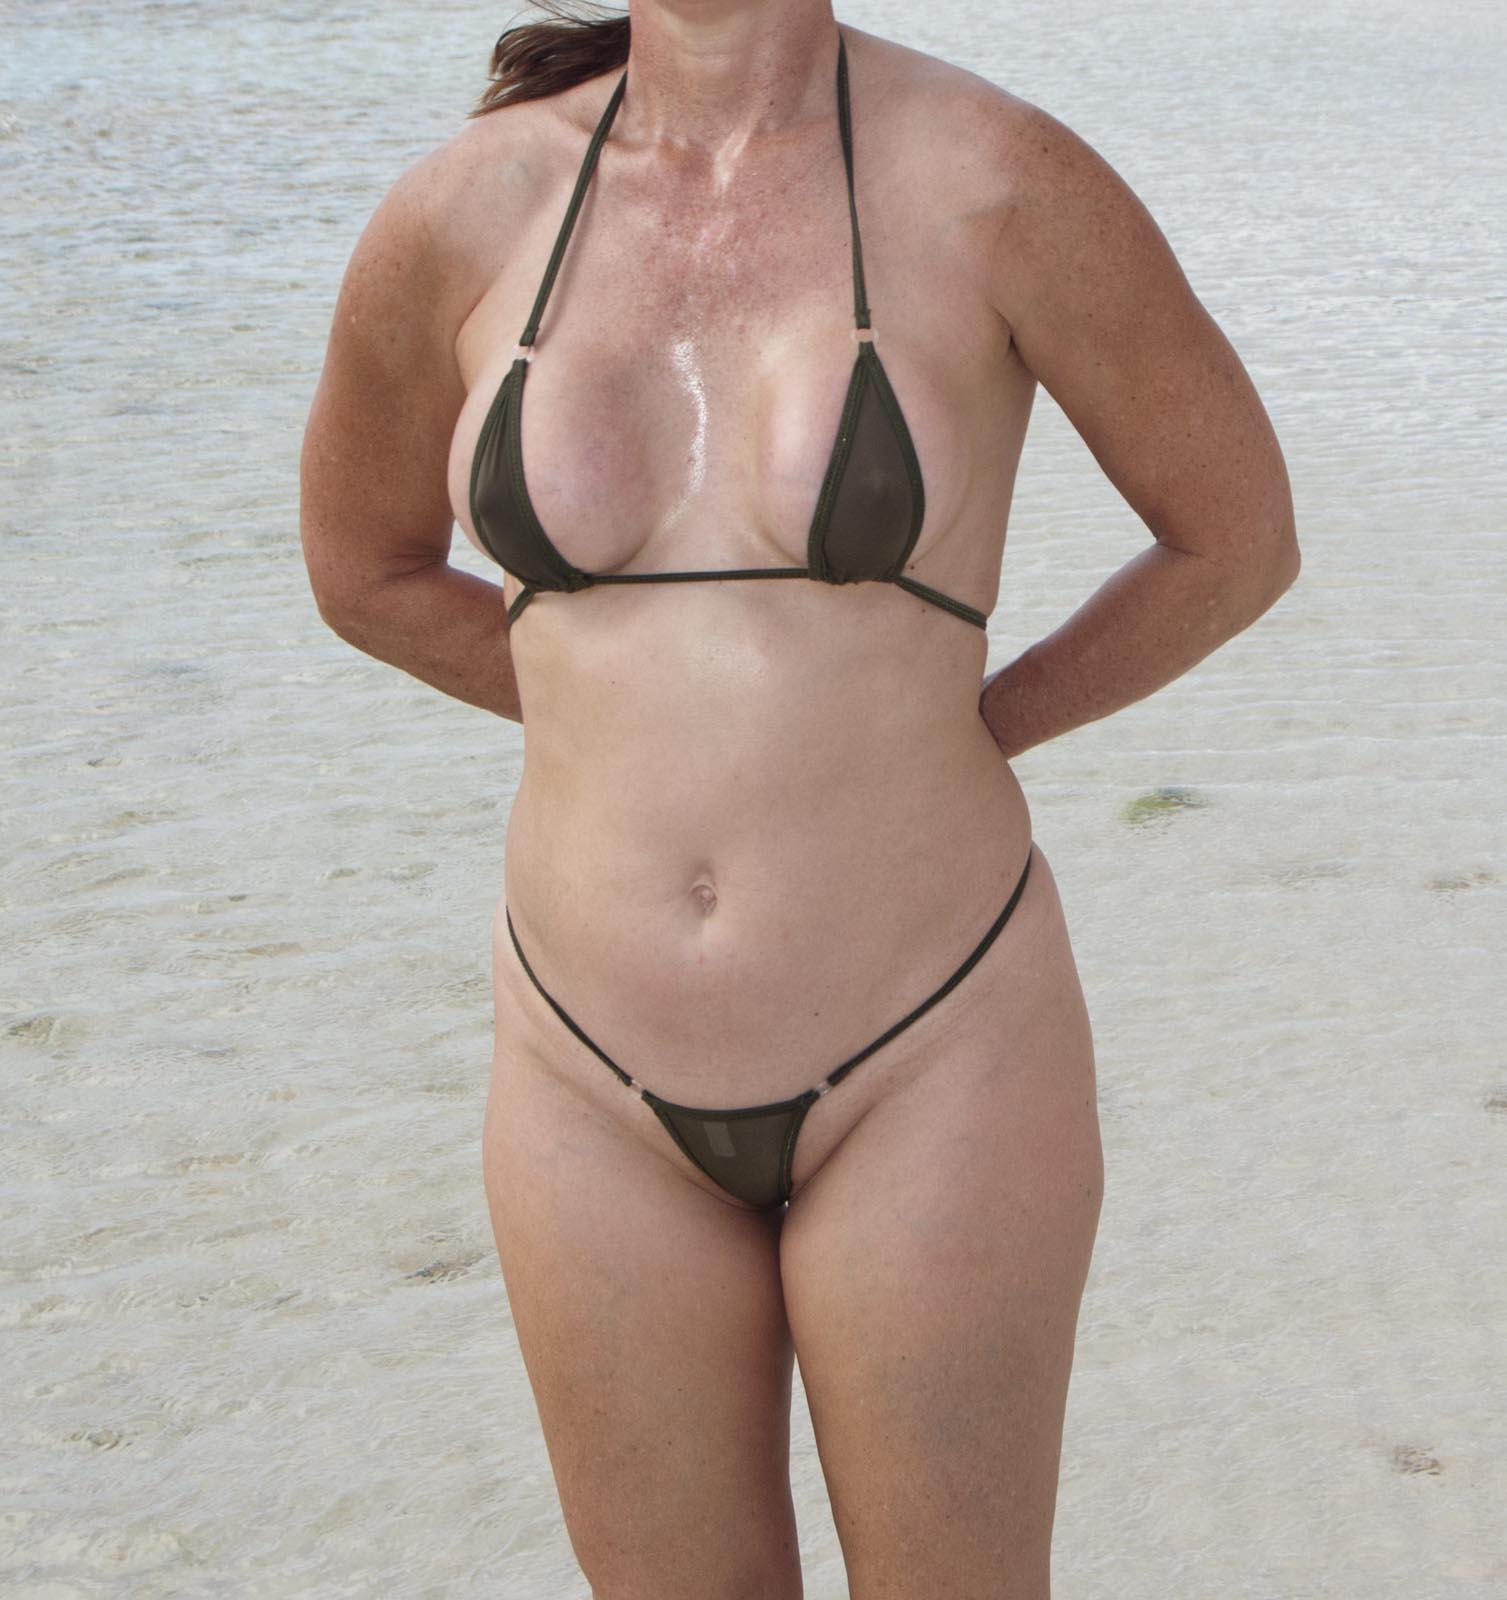 Pity, that New string bikini